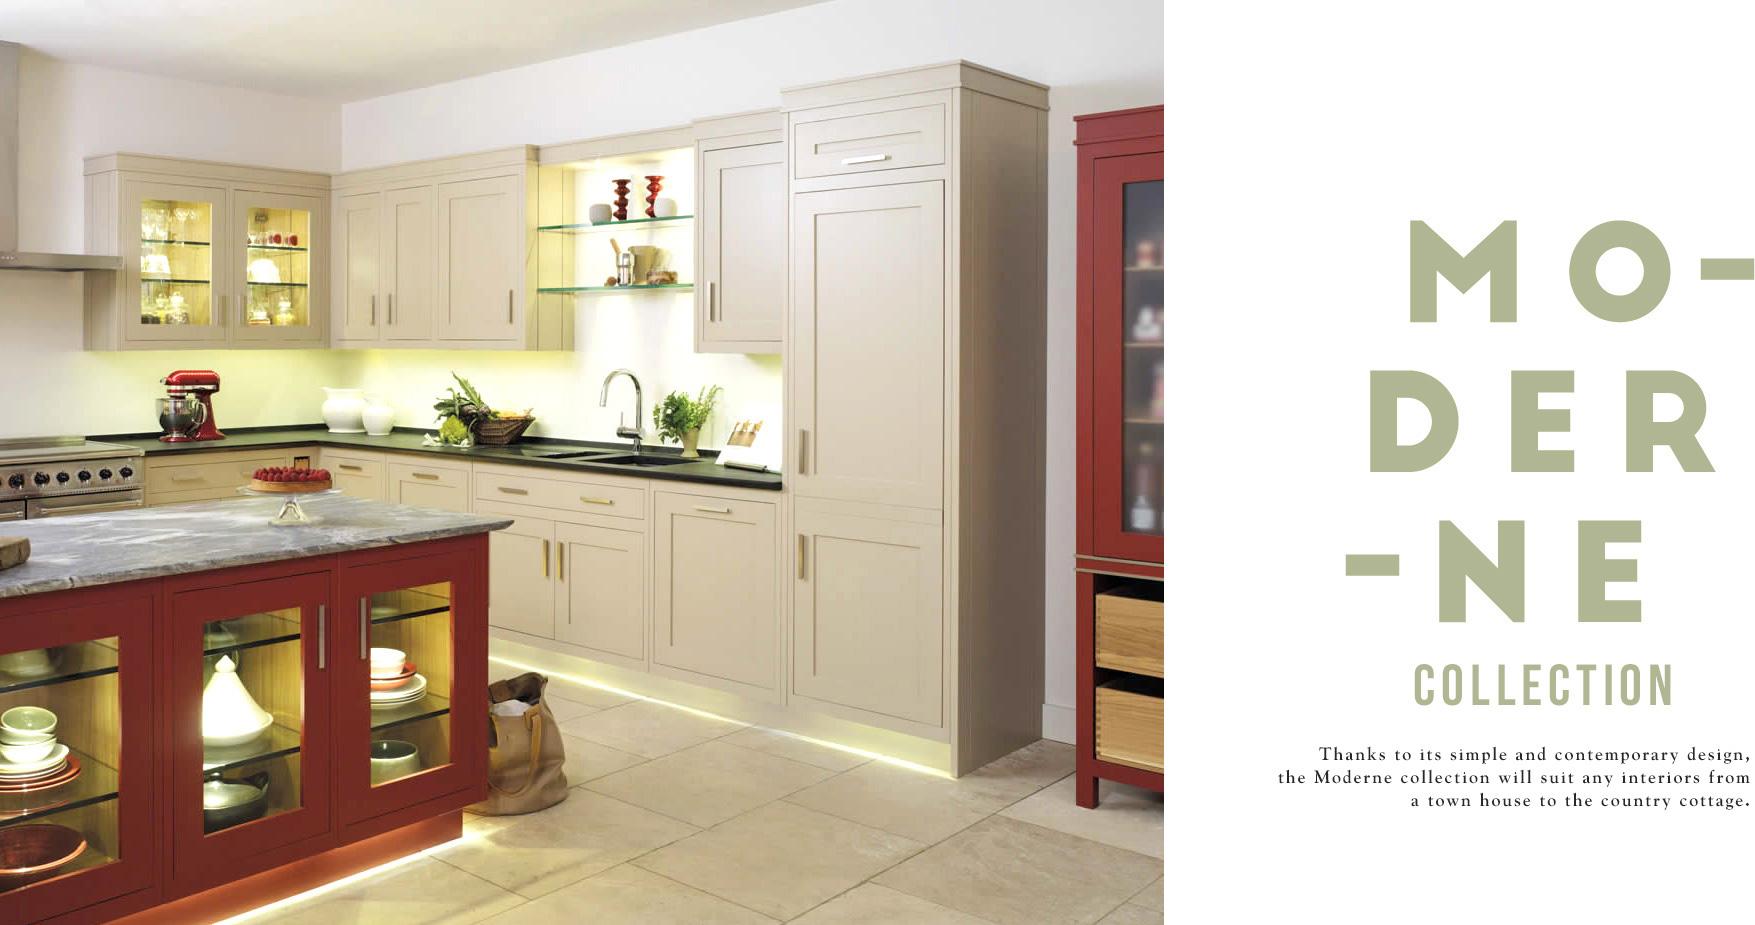 Cucine Aga. Tradein Offer Aga Dual Control Oven With Cucine Aga ...